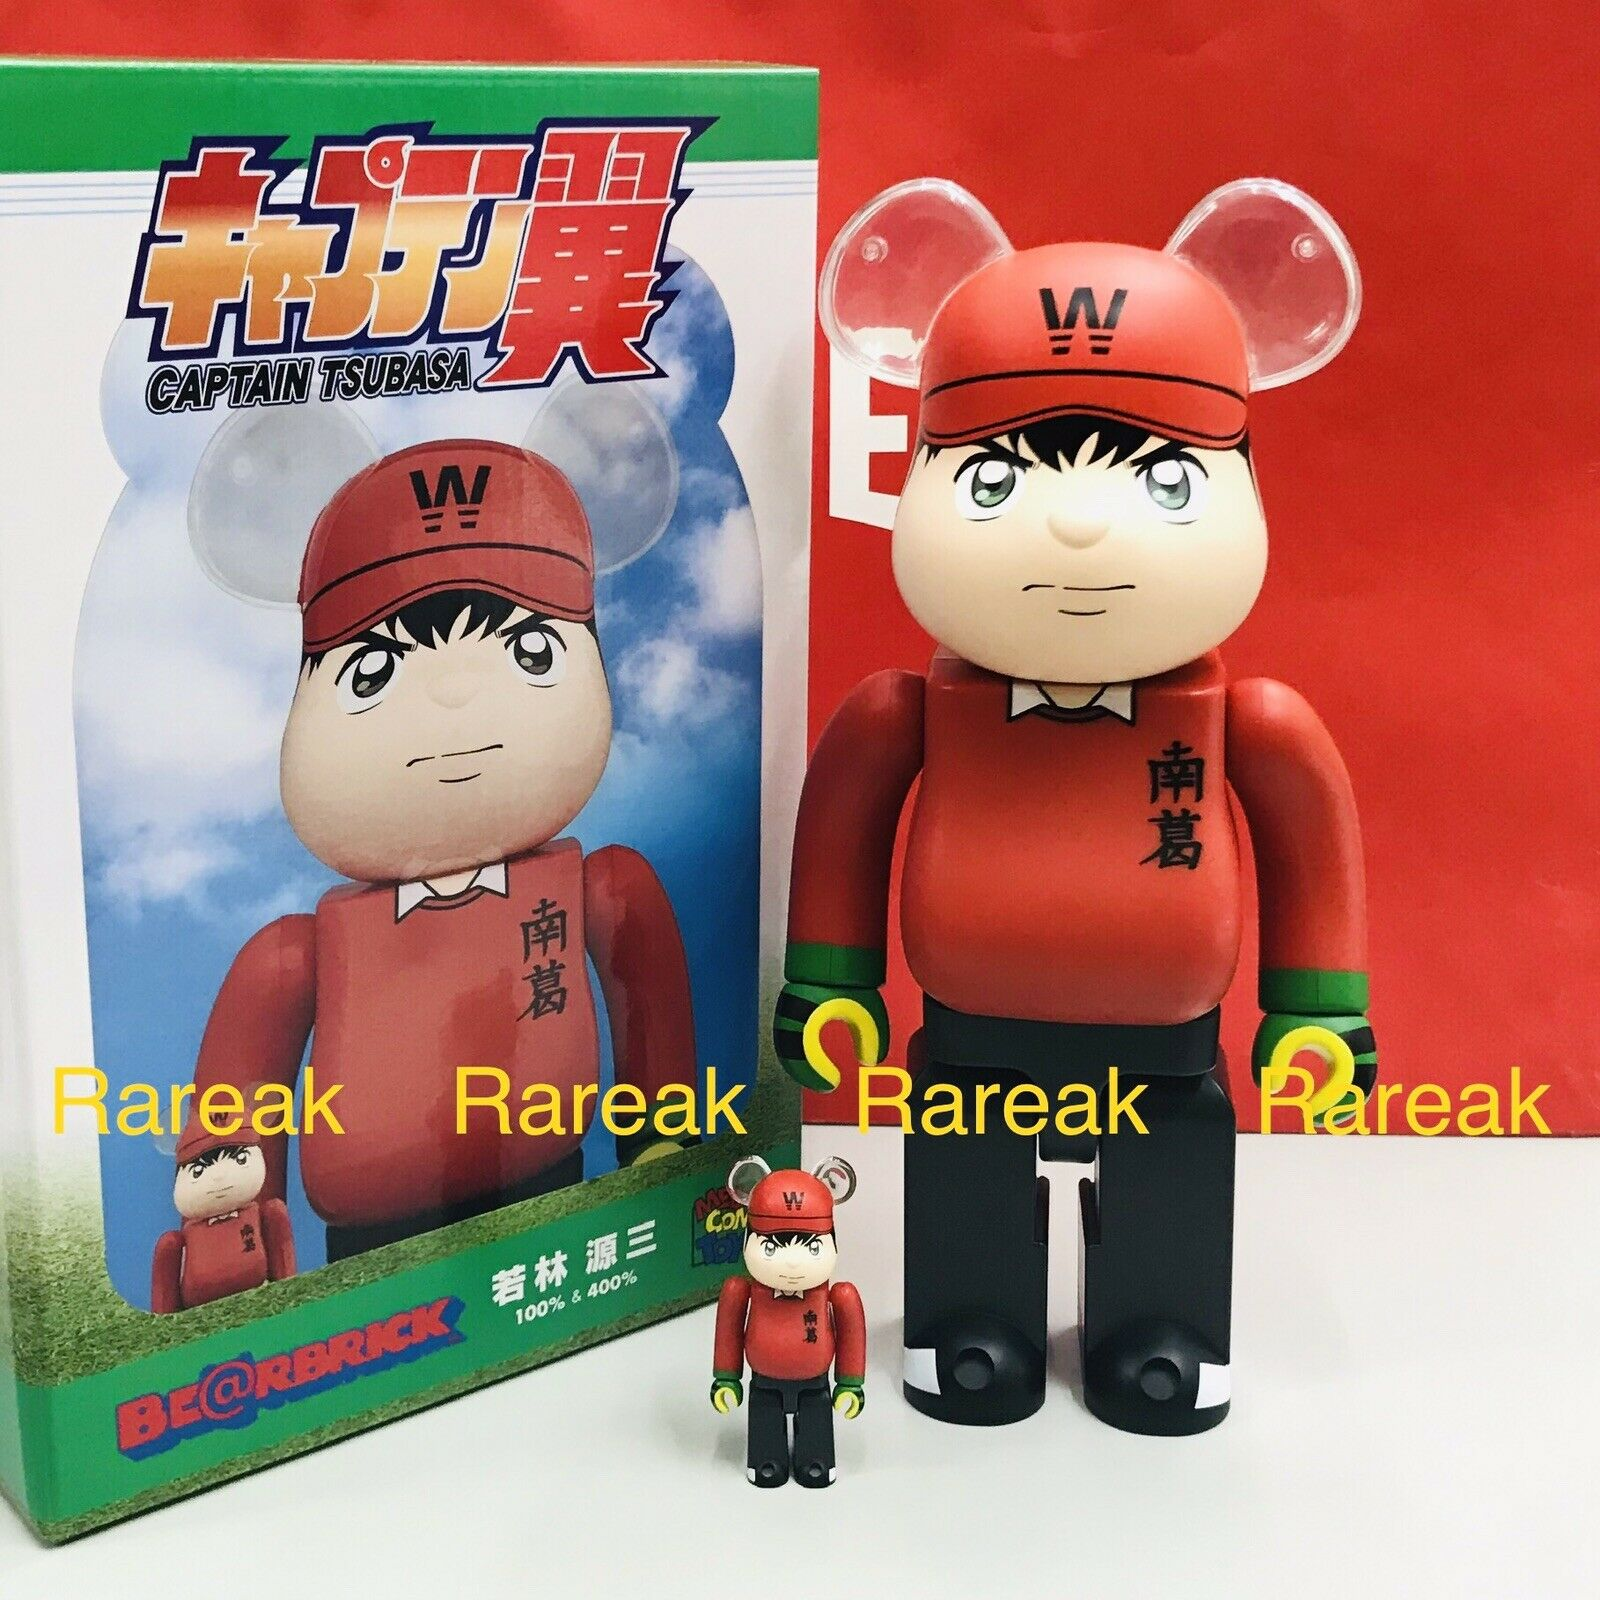 Medicom be@ rbrick Kapten Tsubasa 400% 100% Genzo Wakabayshi Bearbrick boxset